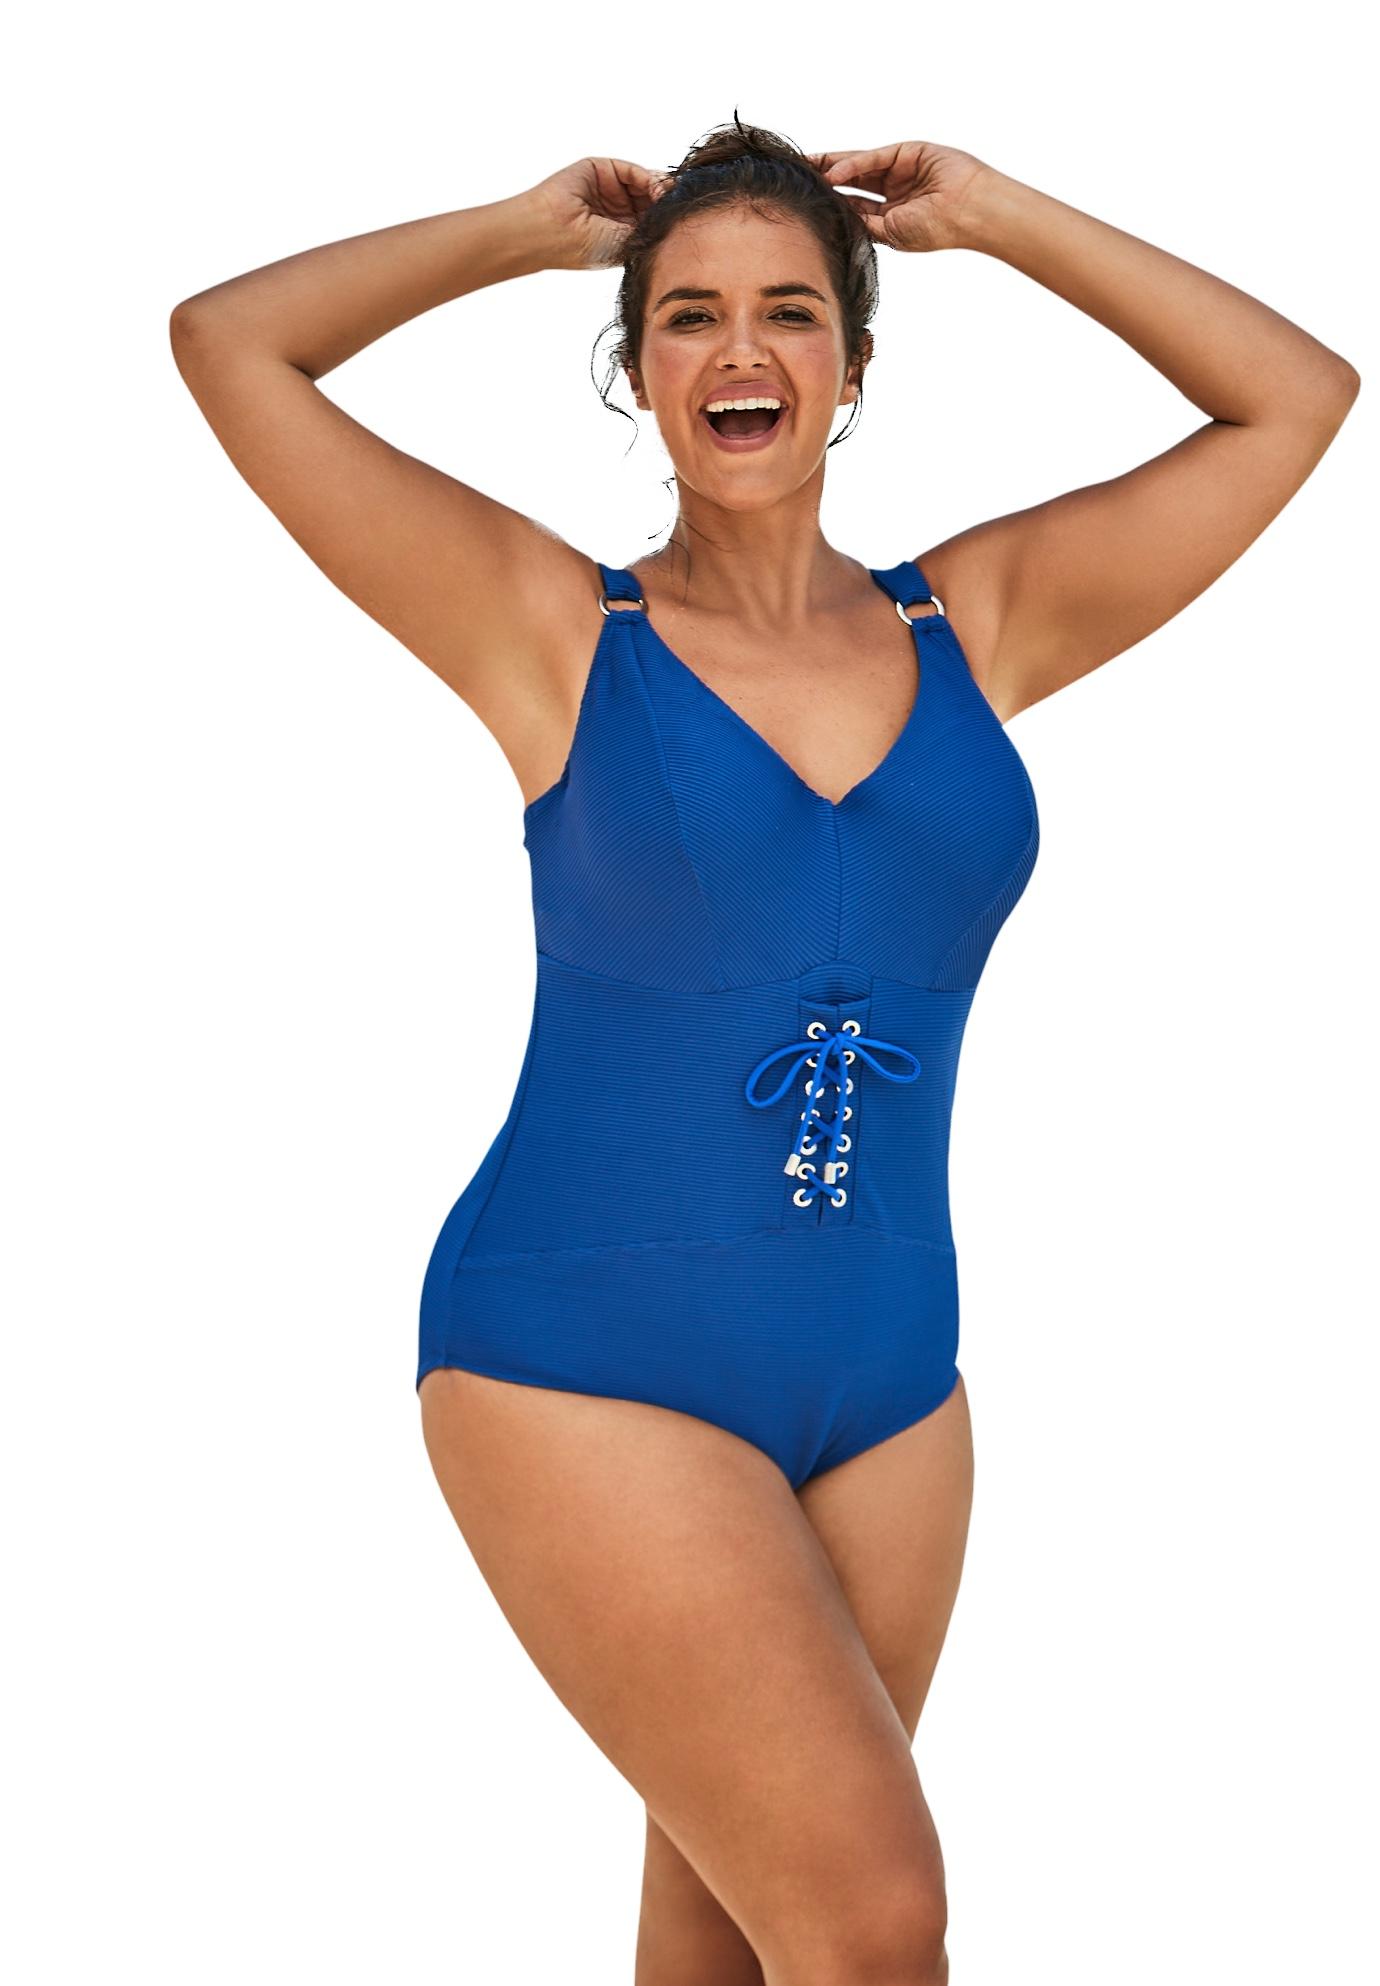 Plus Size Women's Ribbed Underwire One-Piece by Swim 365 in Dream Blue